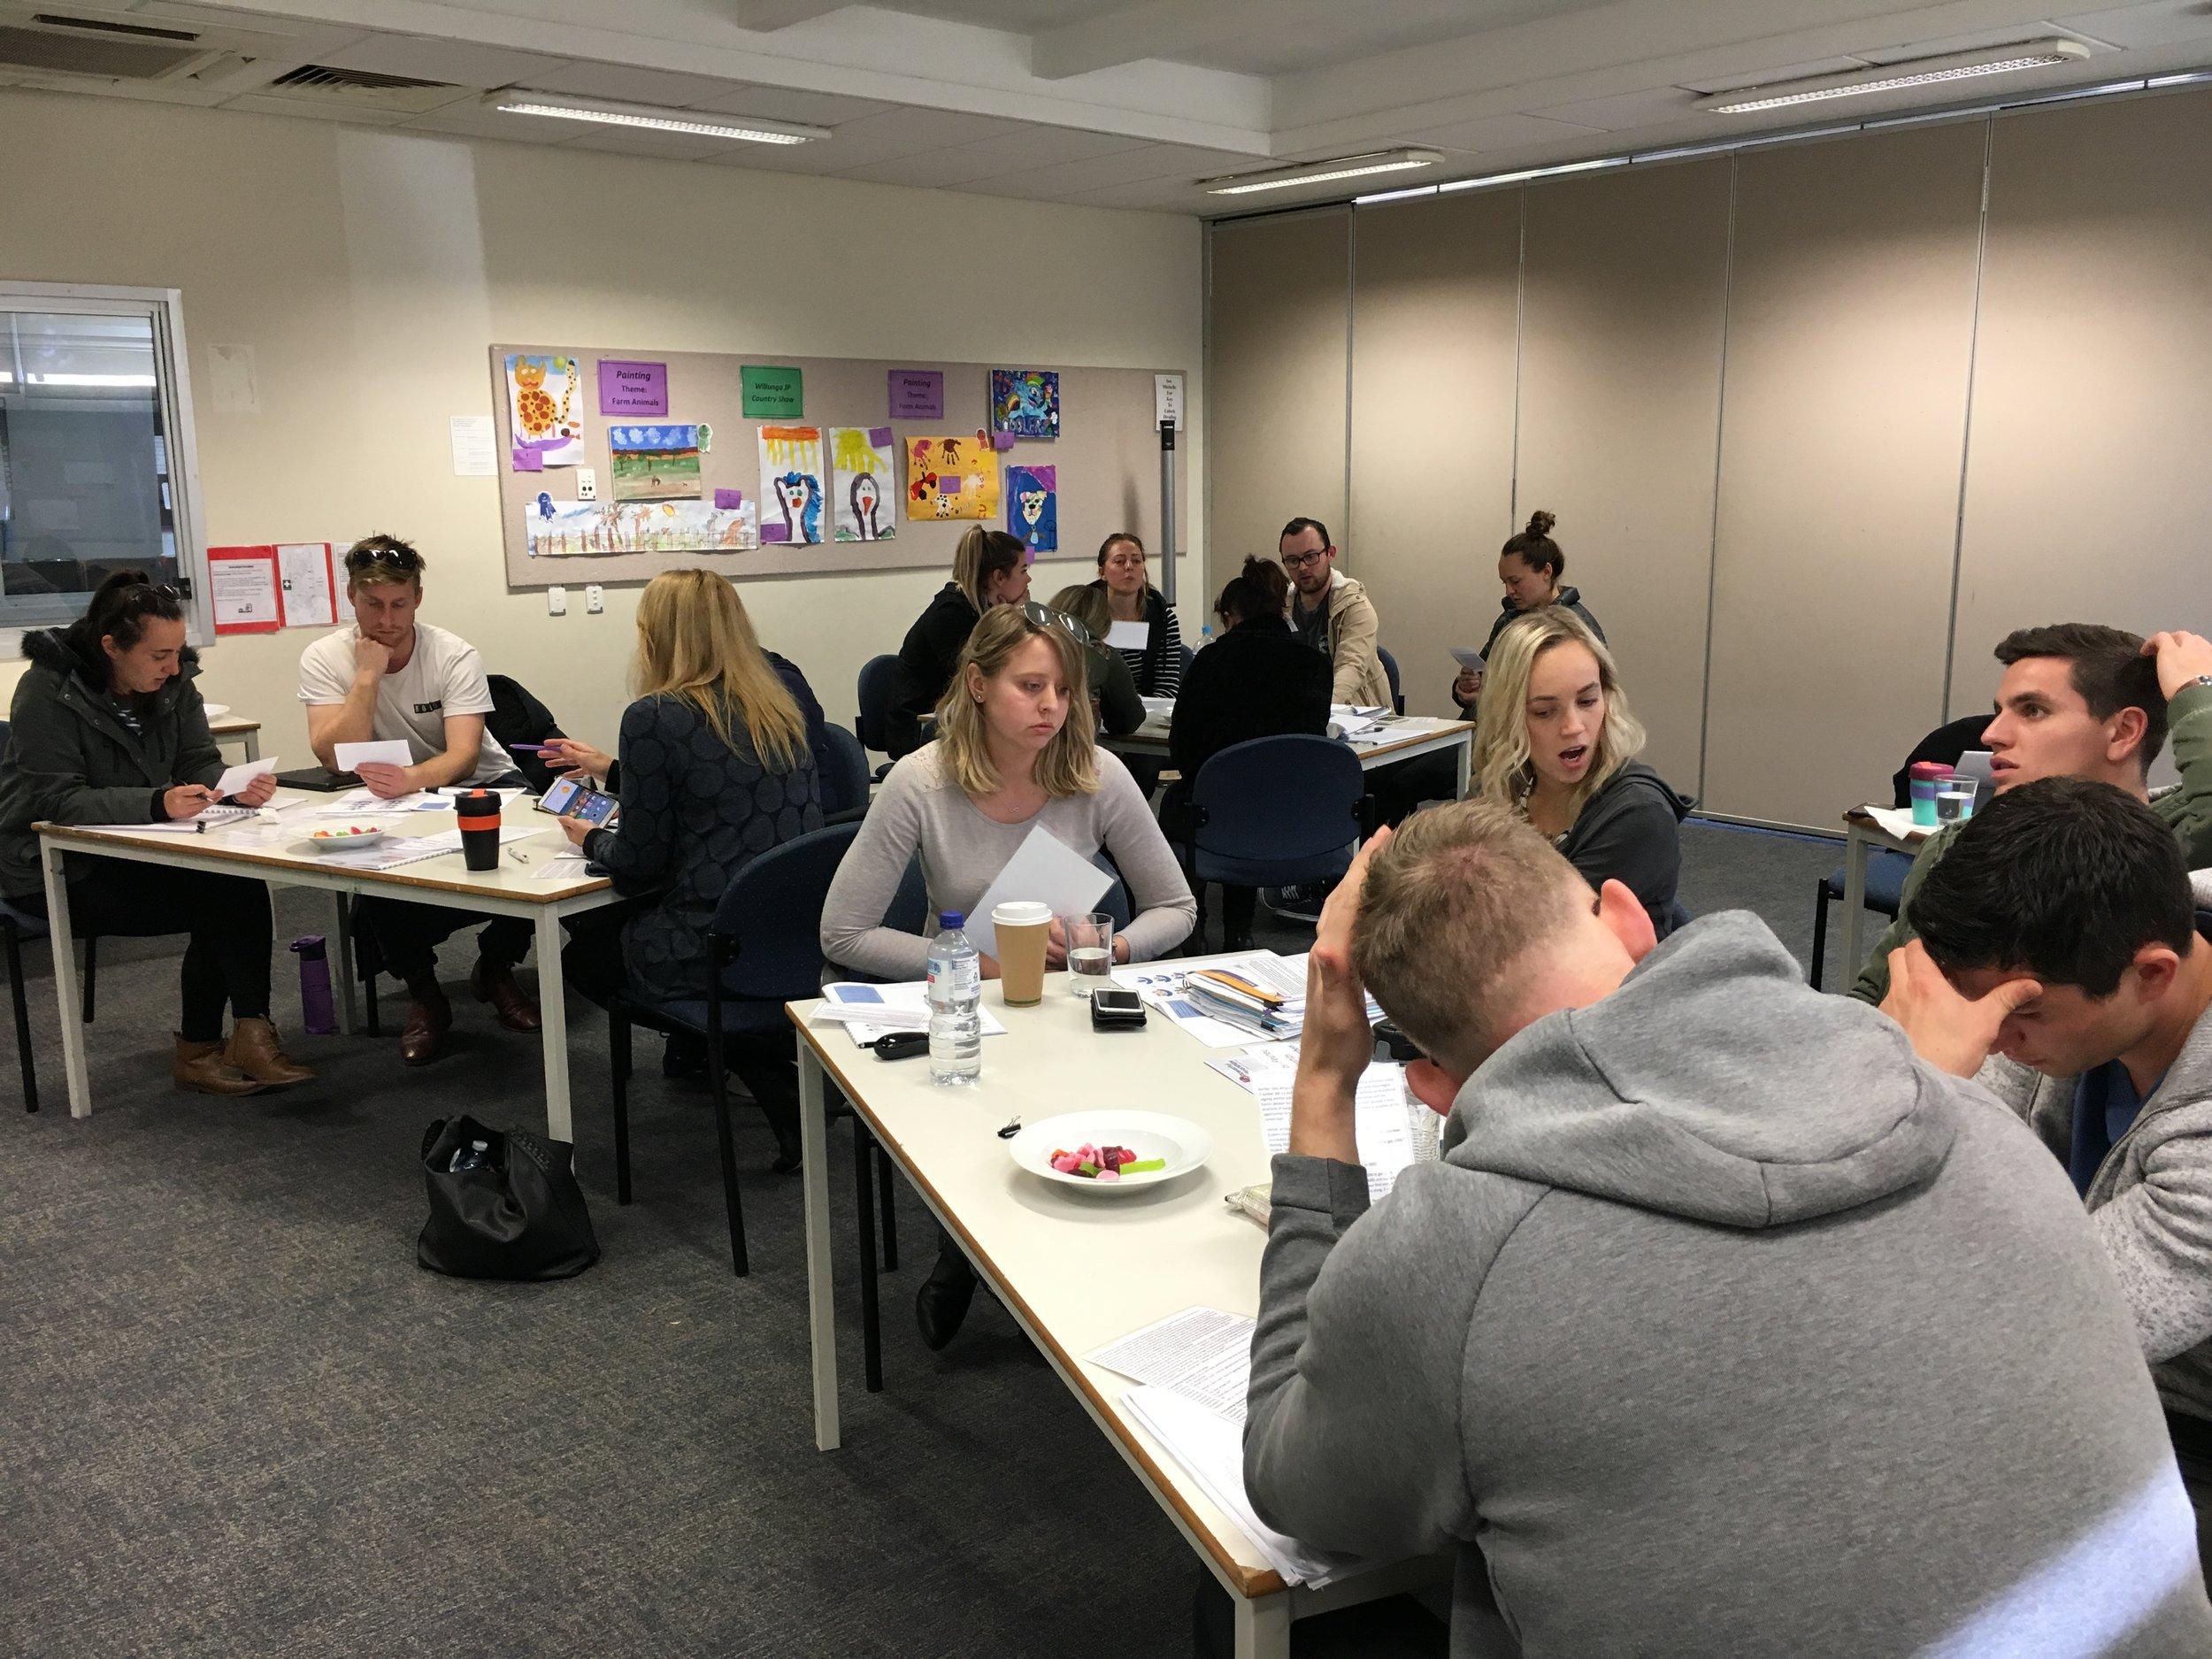 Effective Pedagogy - Early Career Teacher Focus Willunga State School, South Australia